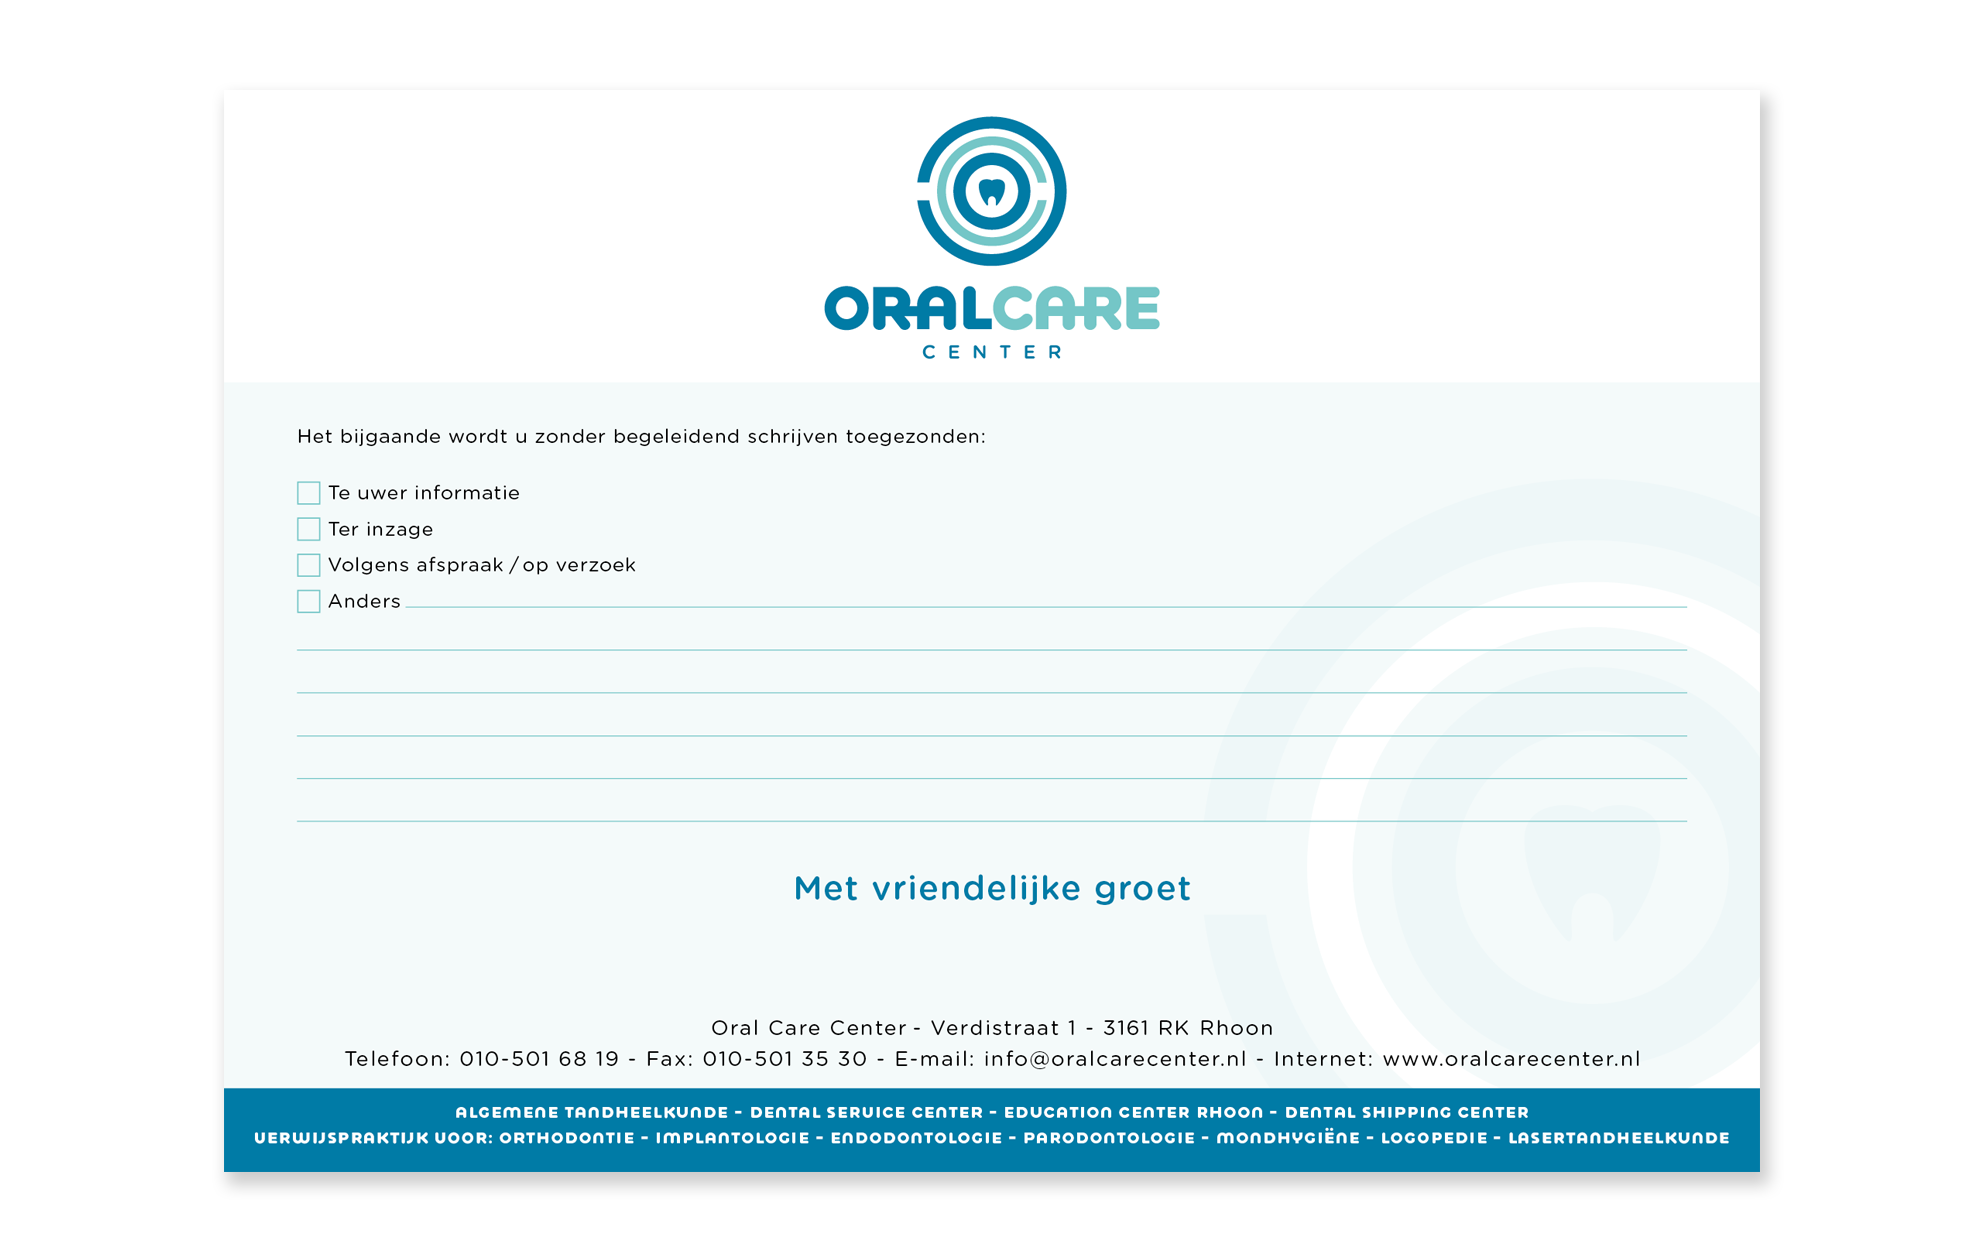 OralCare With Compl_OCC_pms